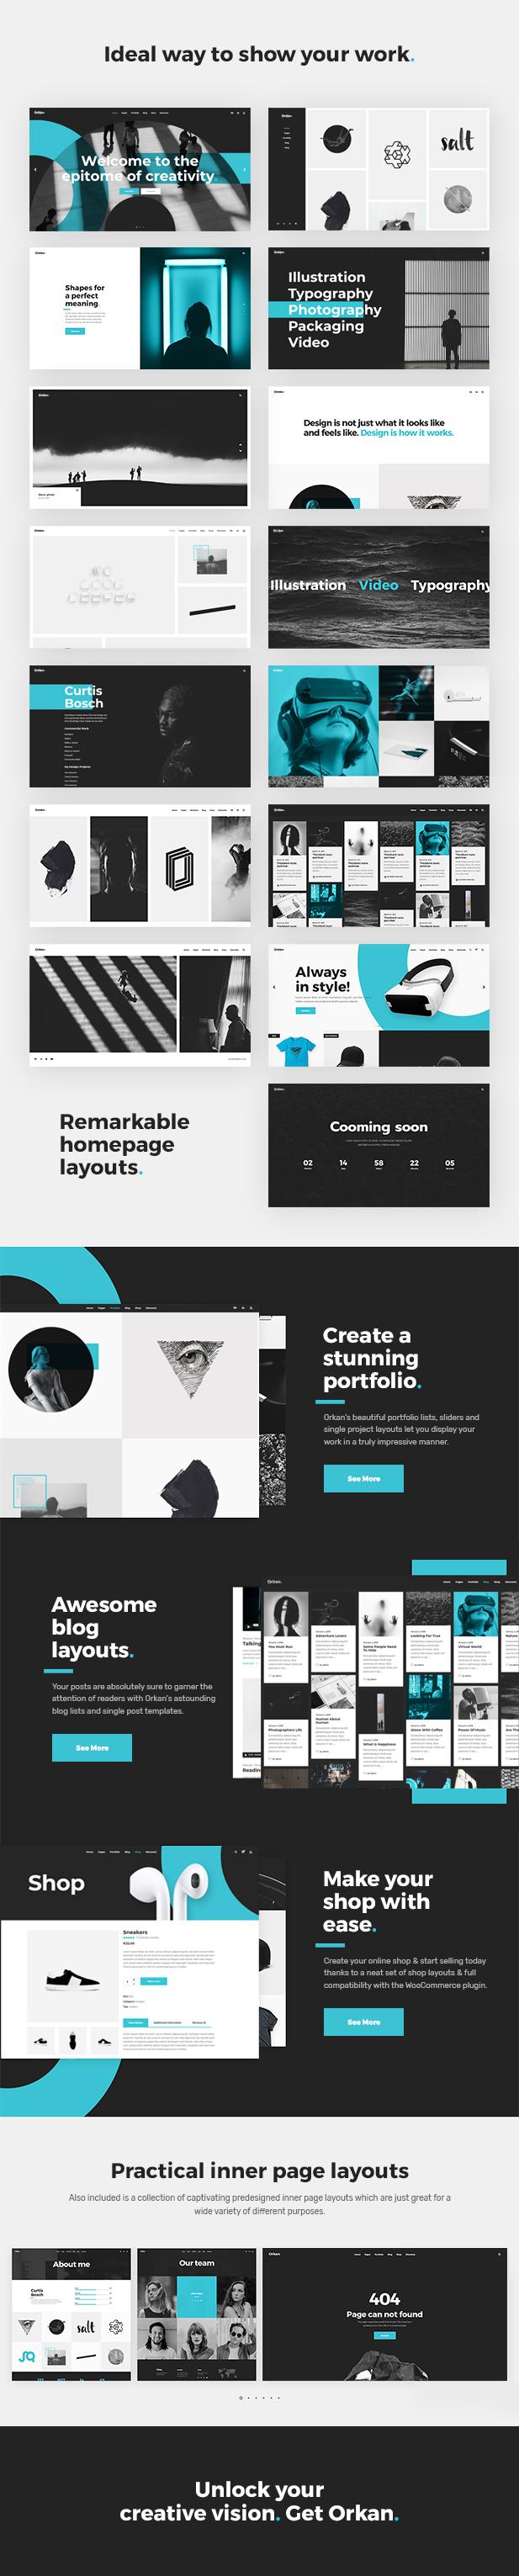 Orkan - Artist and Design Agency Portfolio Theme - 1